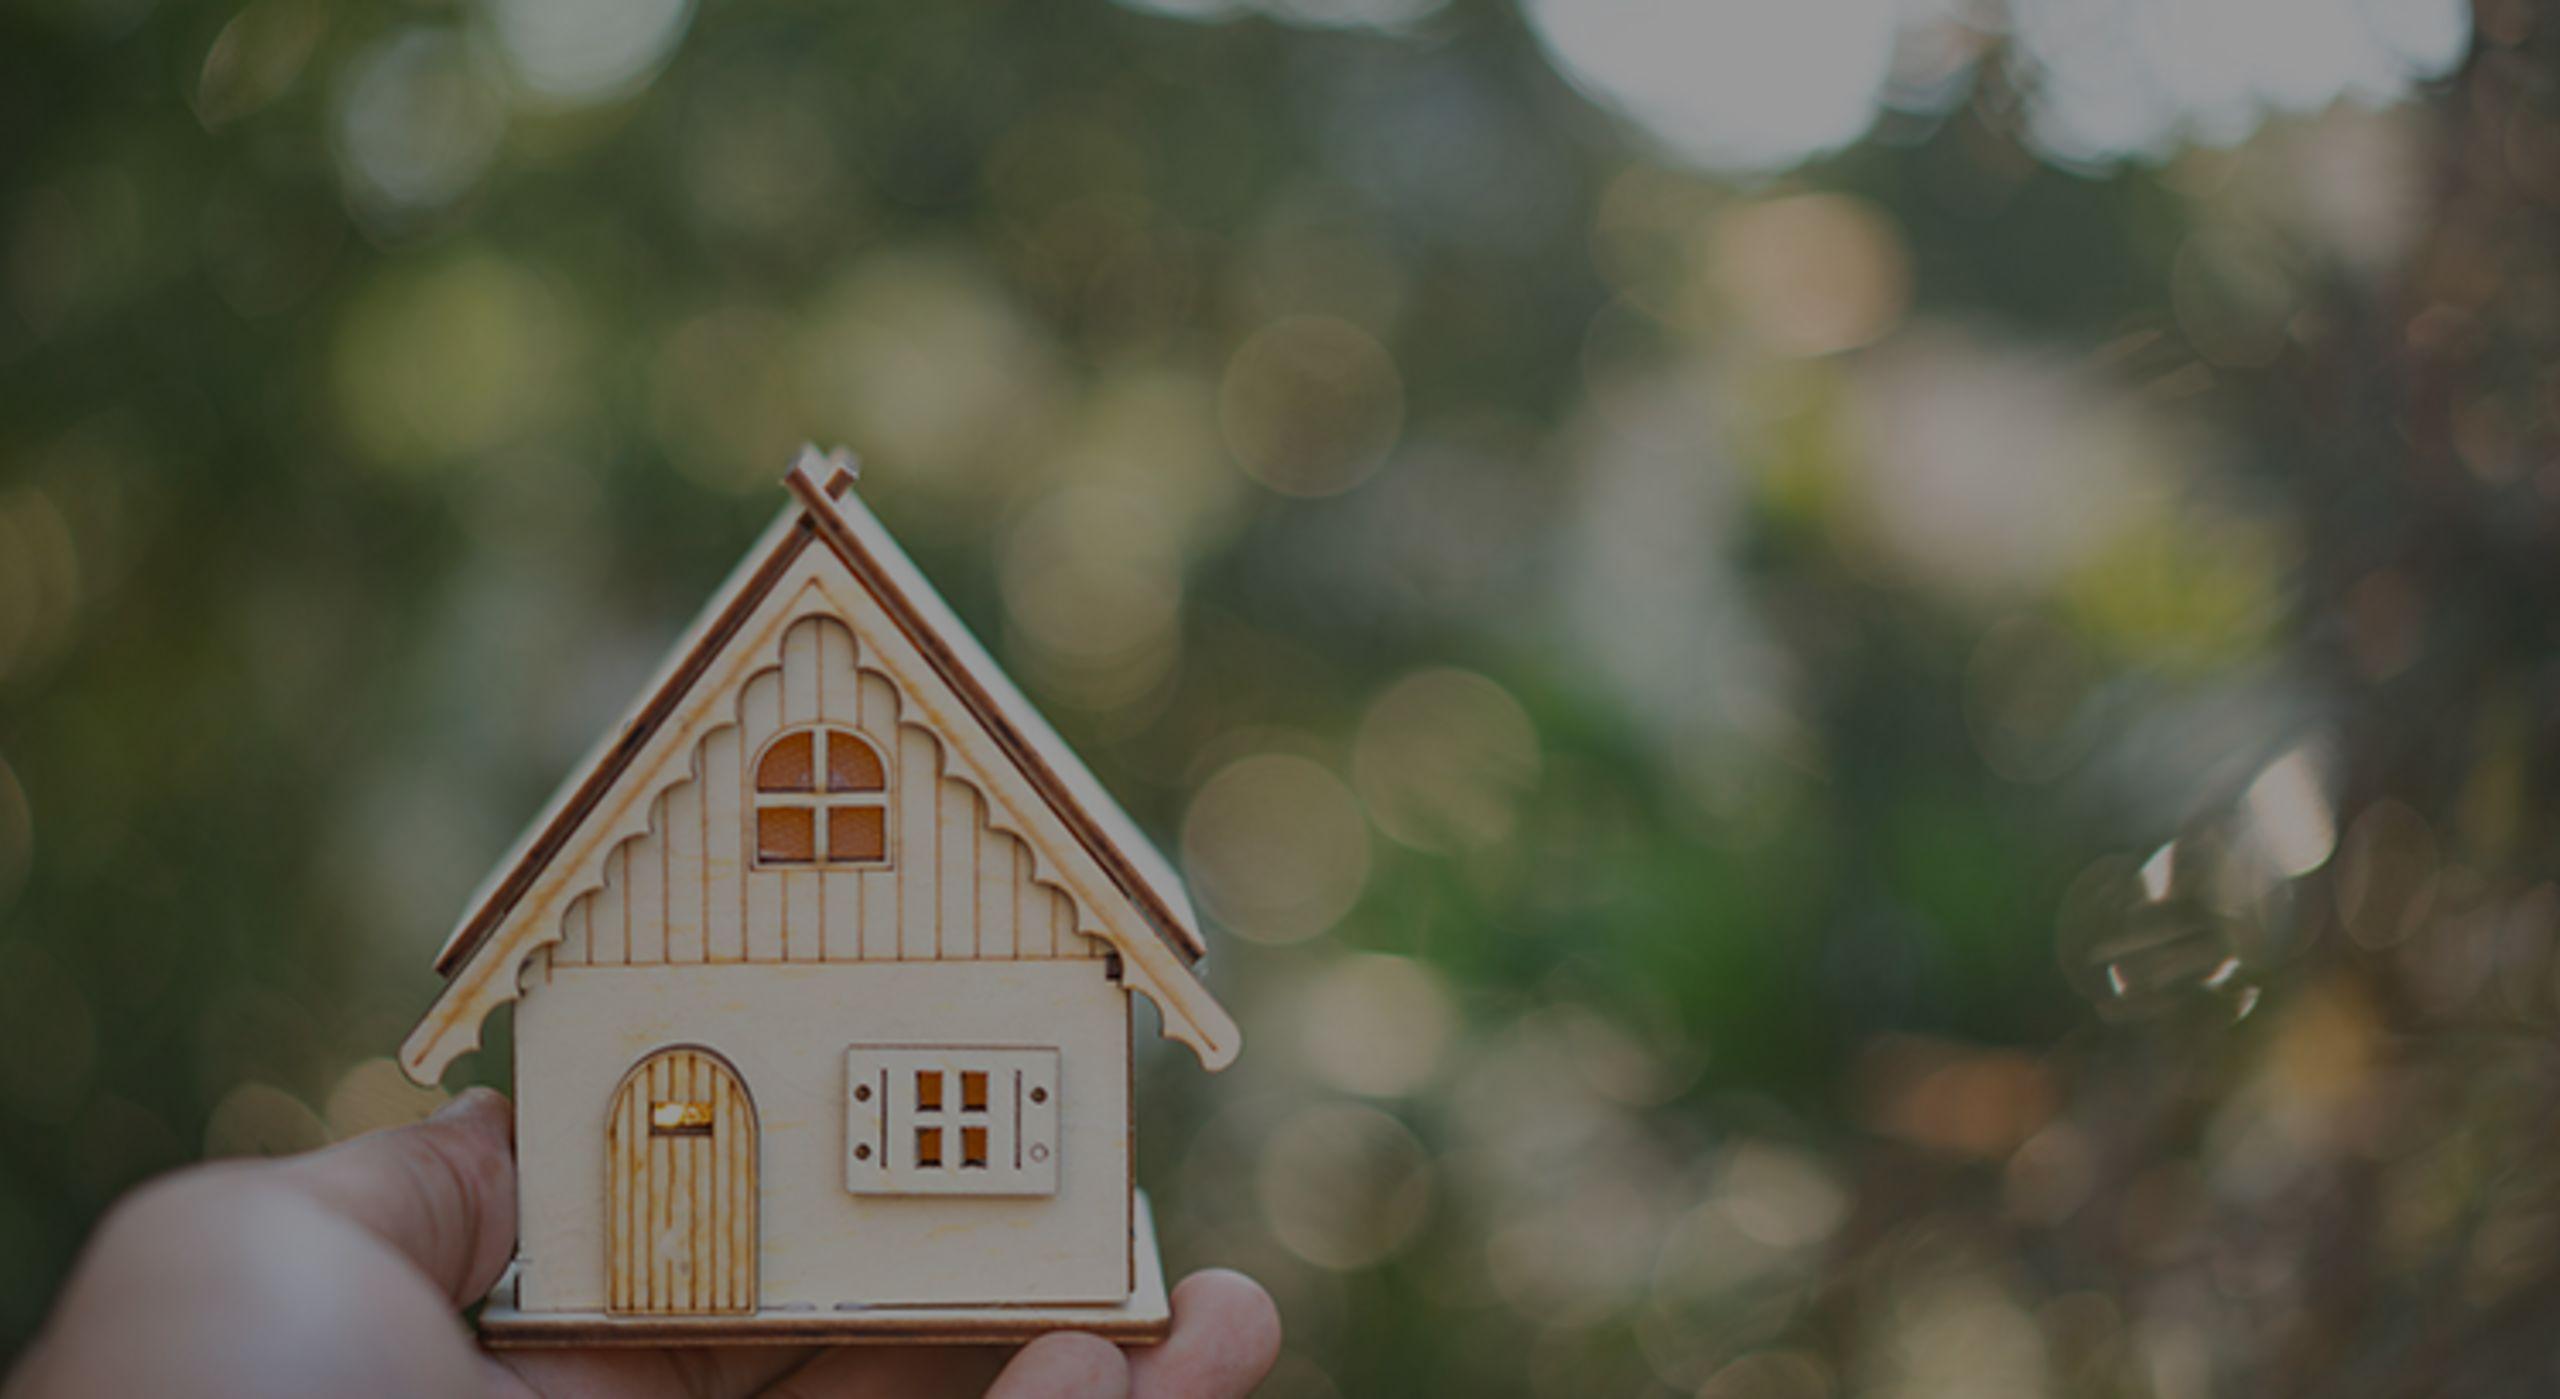 Perspectivas de la vivienda 2020